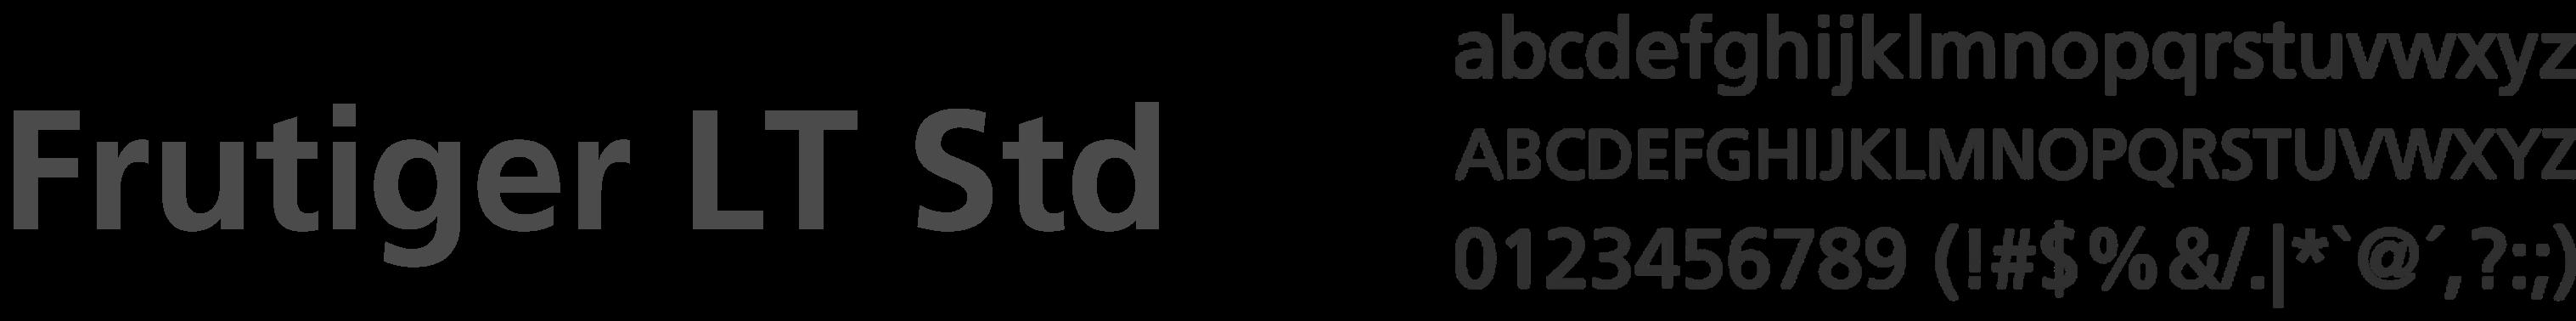 FPO Database